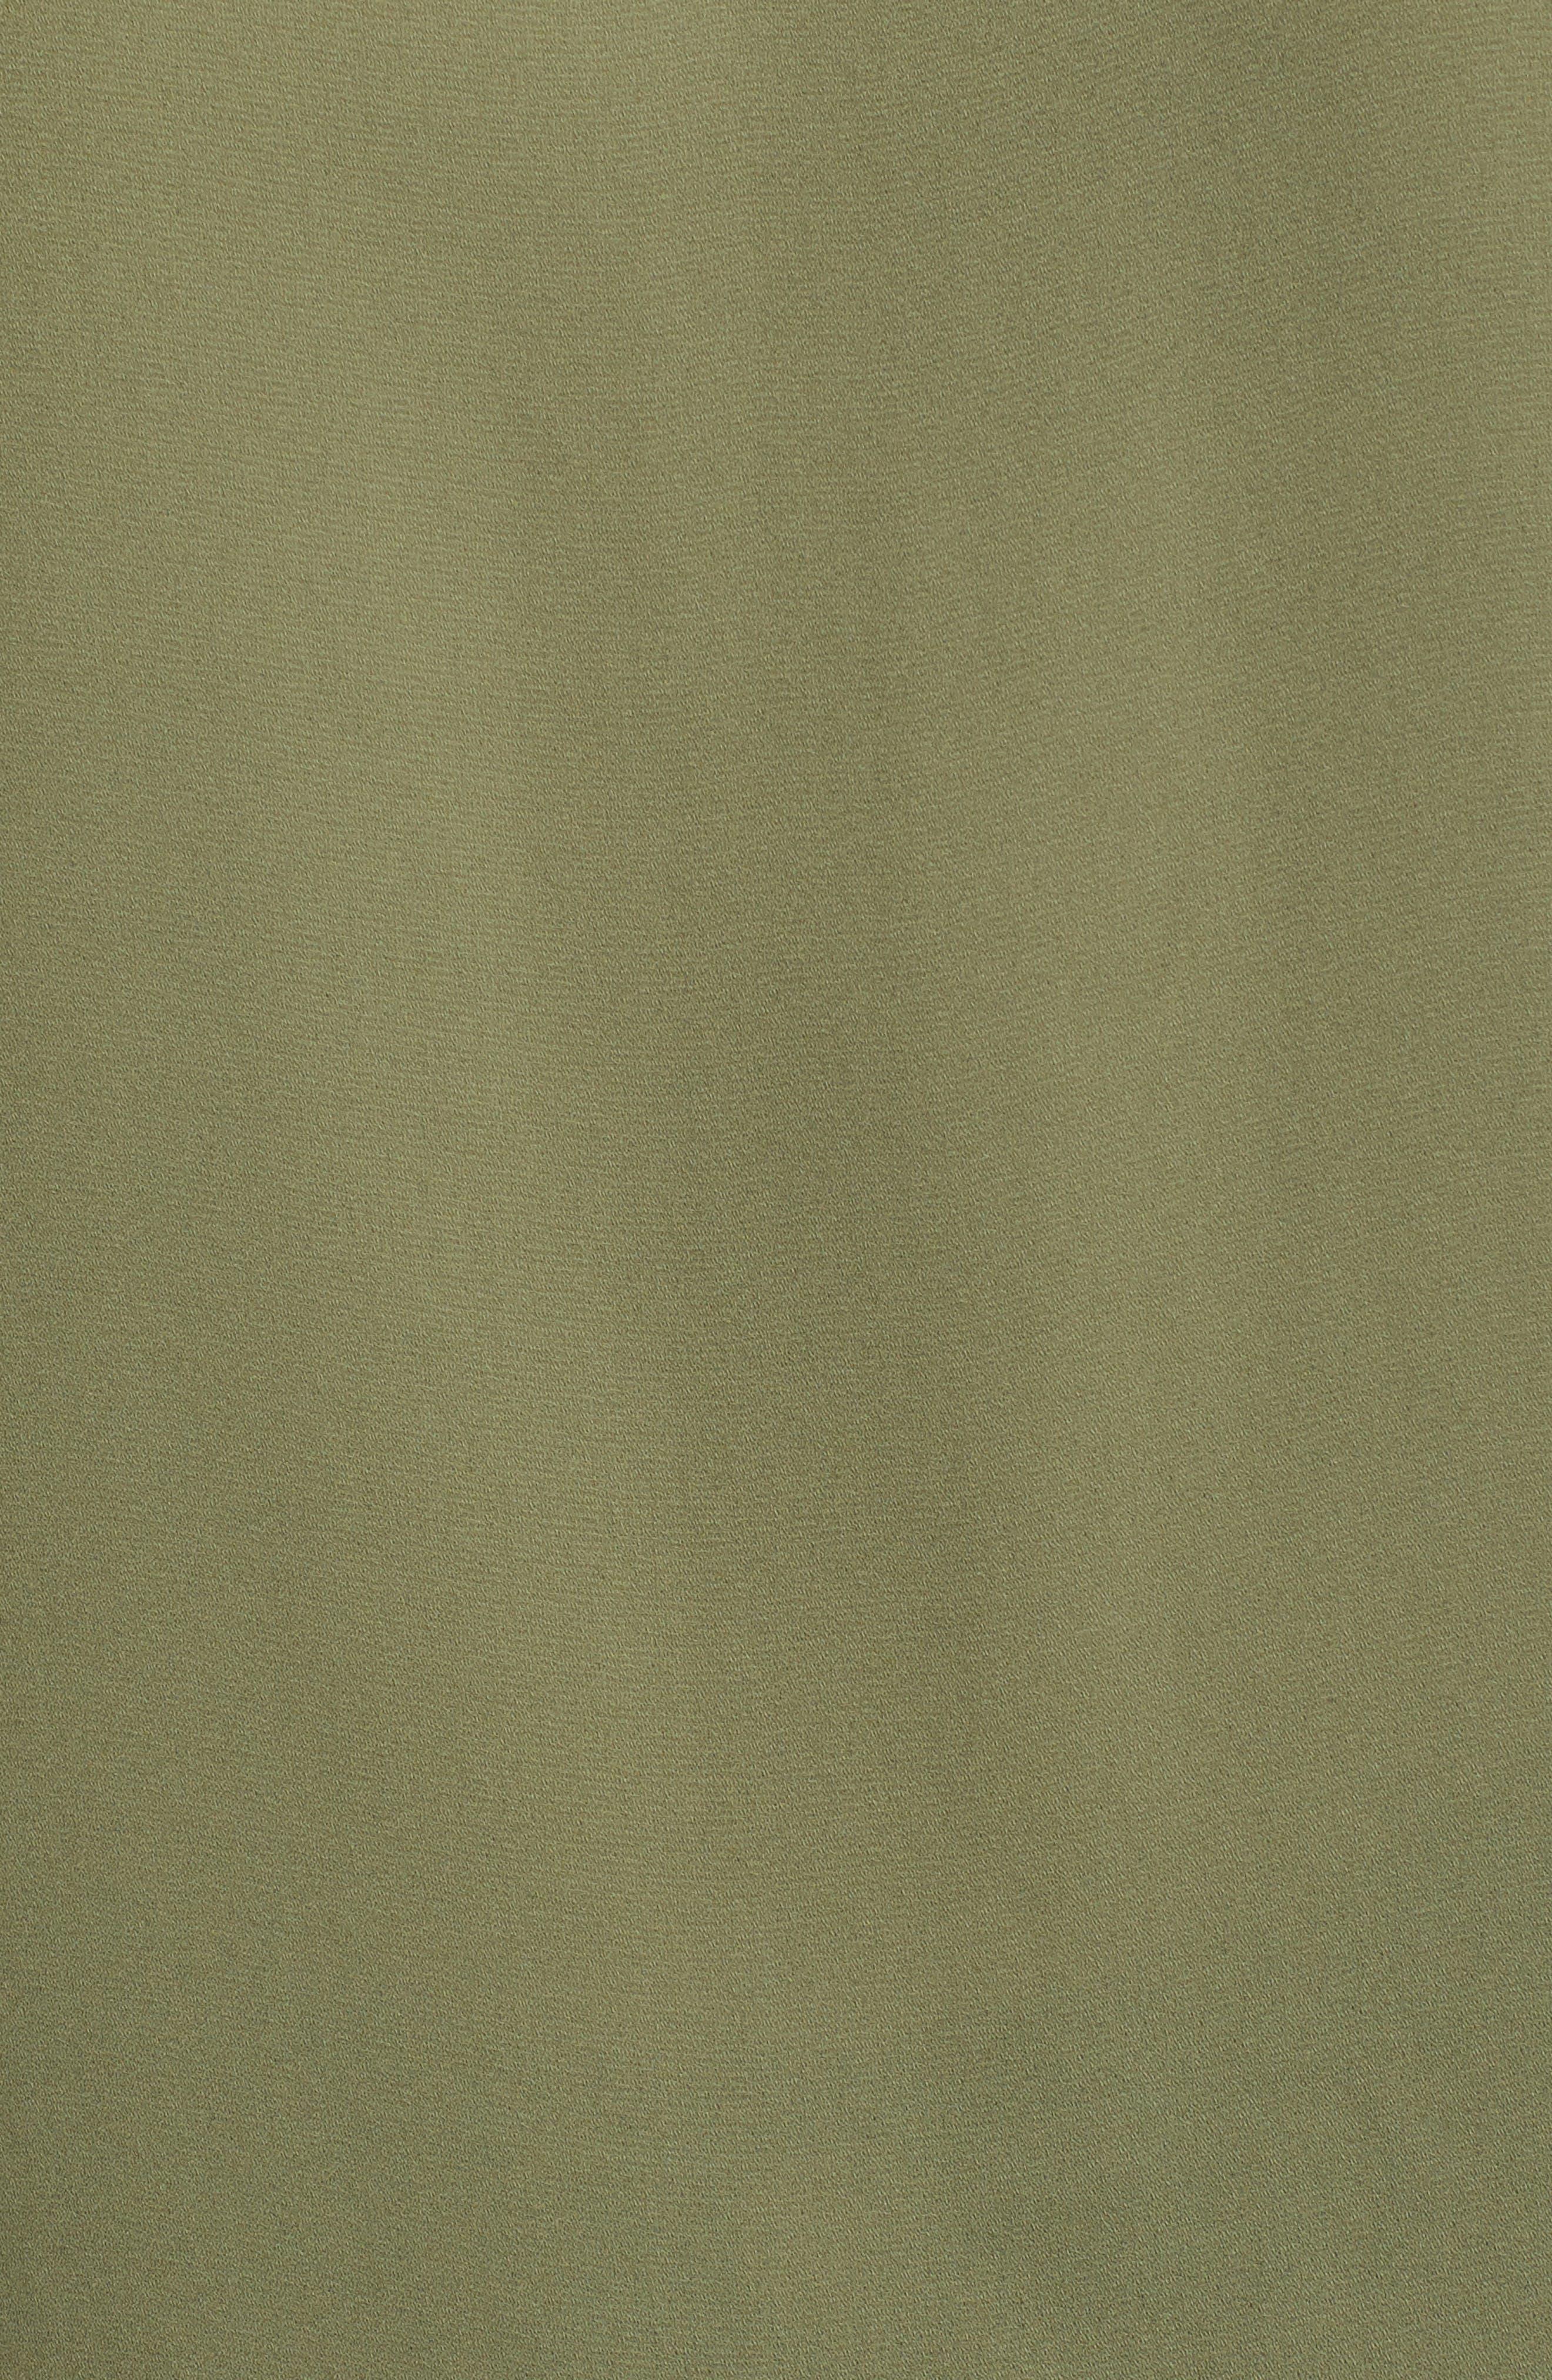 J.Crew Drapey V-Neck Ruffle Top,                             Alternate thumbnail 6, color,                             Tawny Olive